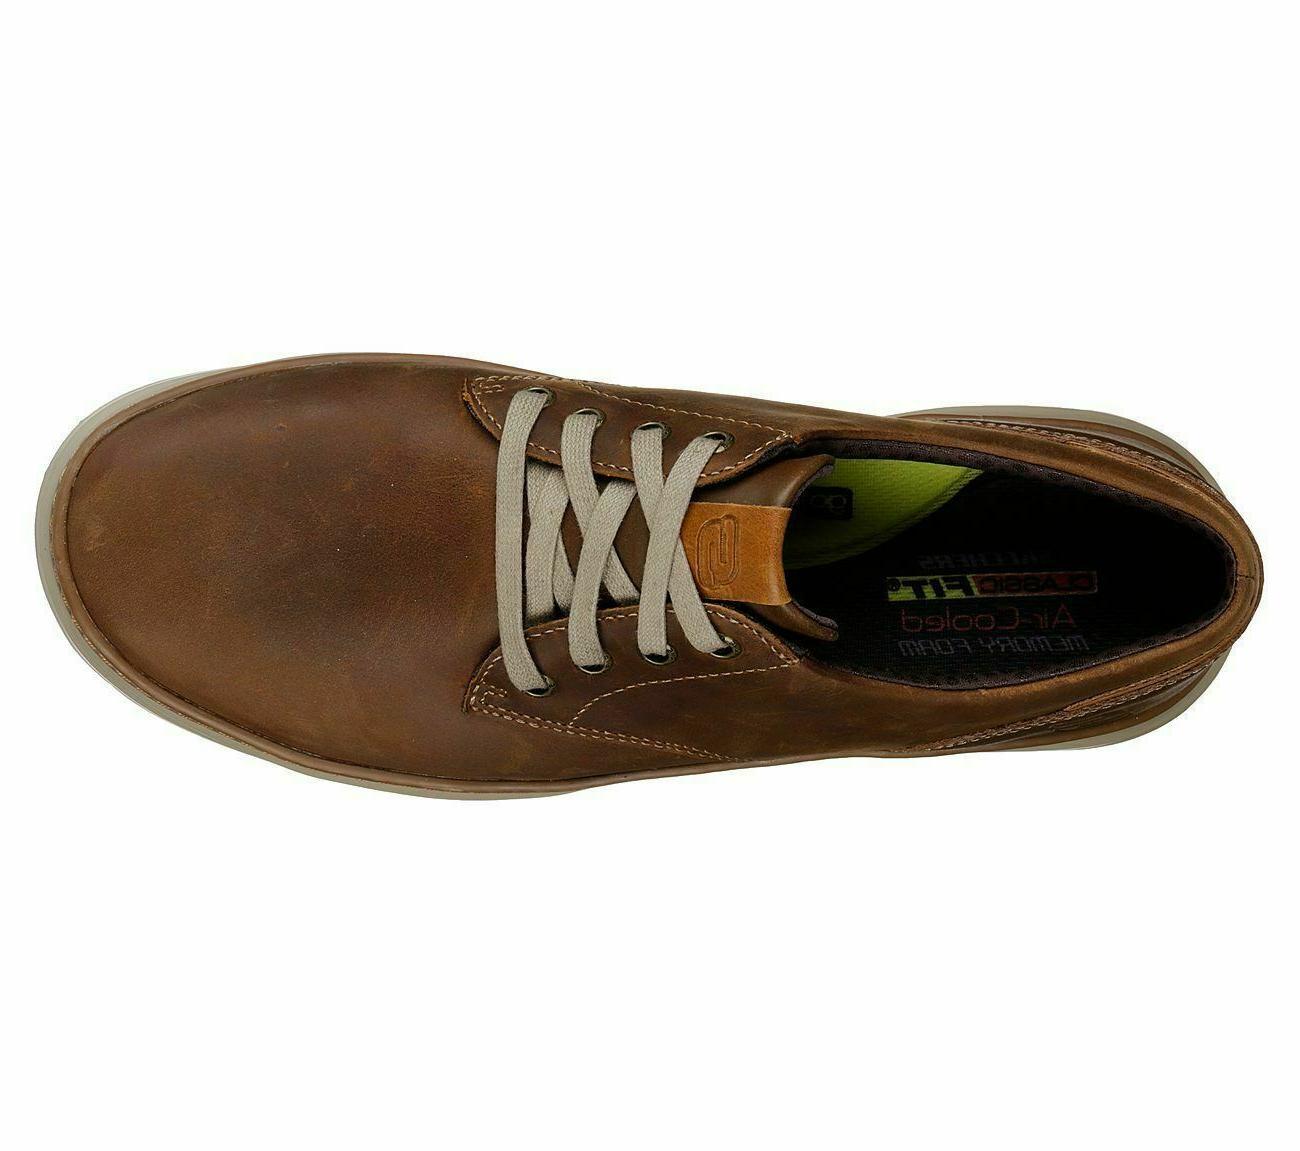 Skechers Leather Shoes Men Memory Foam Sporty Casual Comfort Oxford 66073